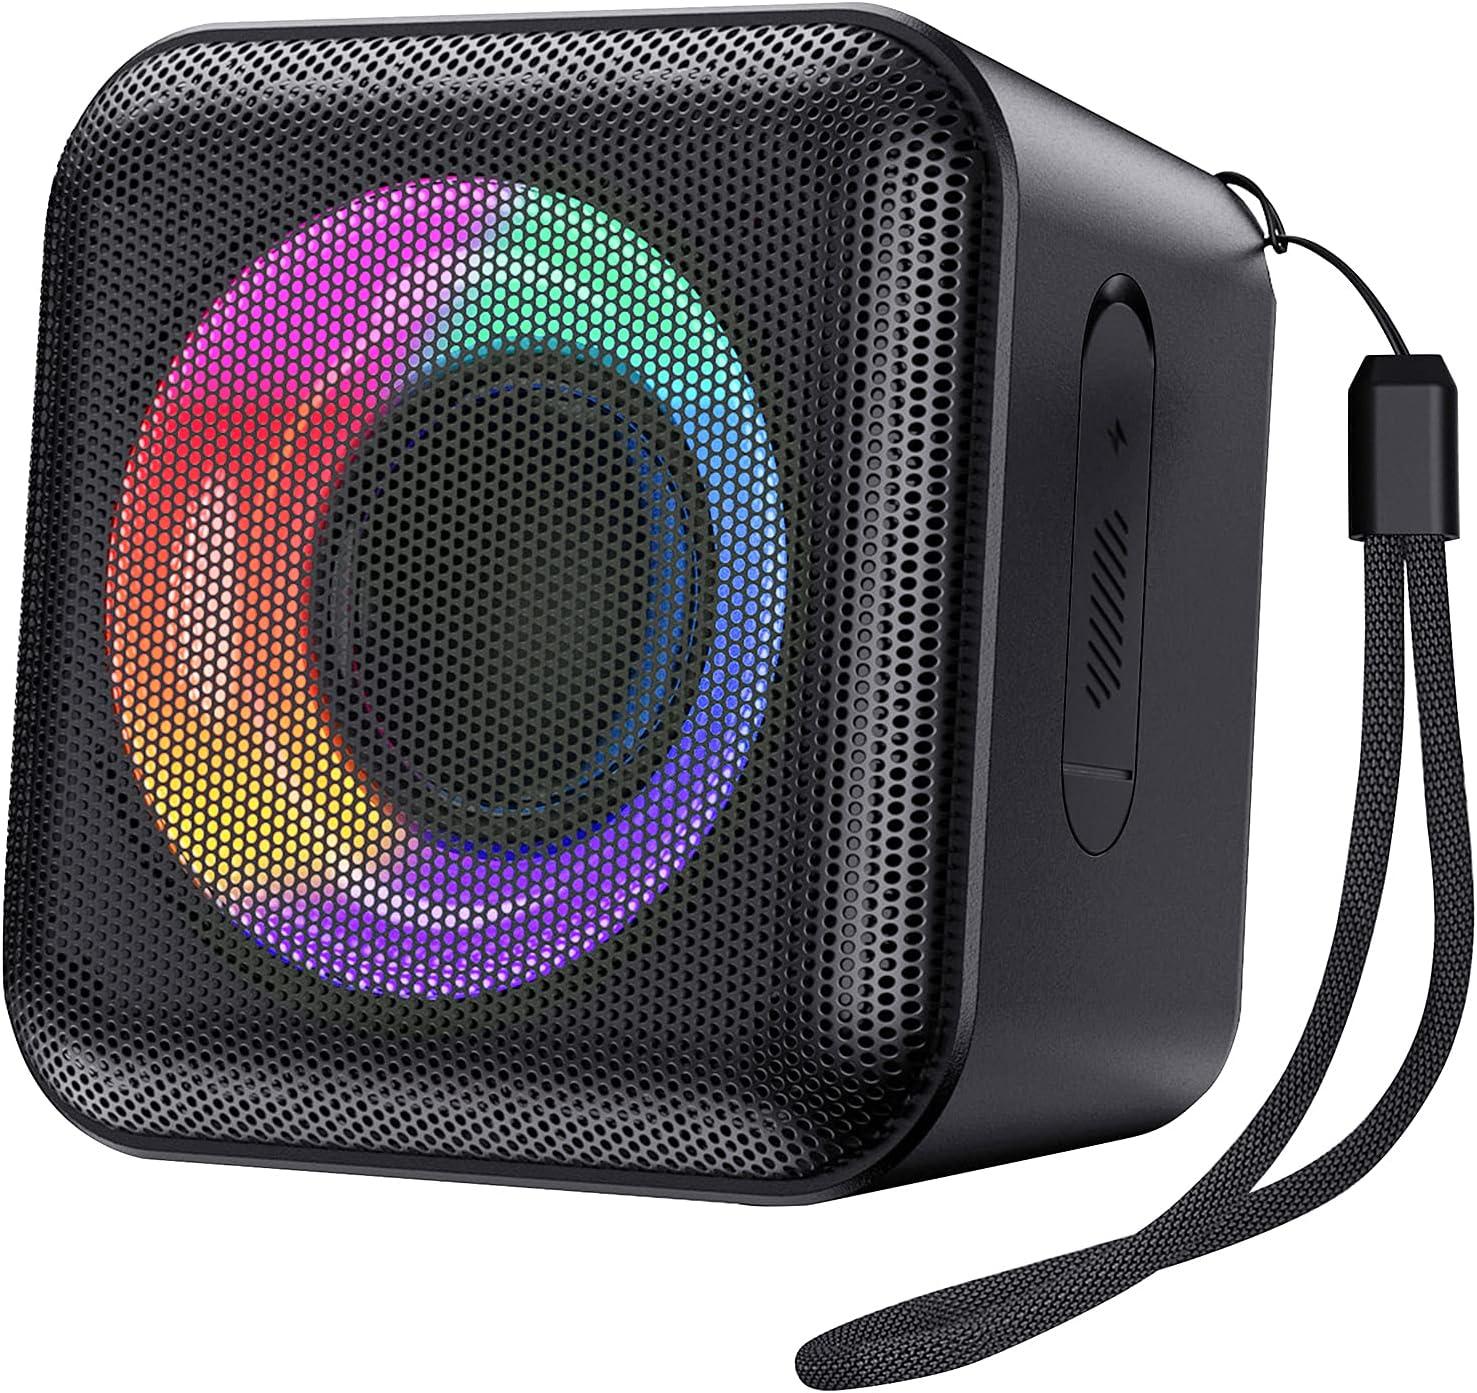 Gorgeous IPX7 Waterproof Portable Bluetooth Speaker Wireless Bl Seattle Mall Sewowibo